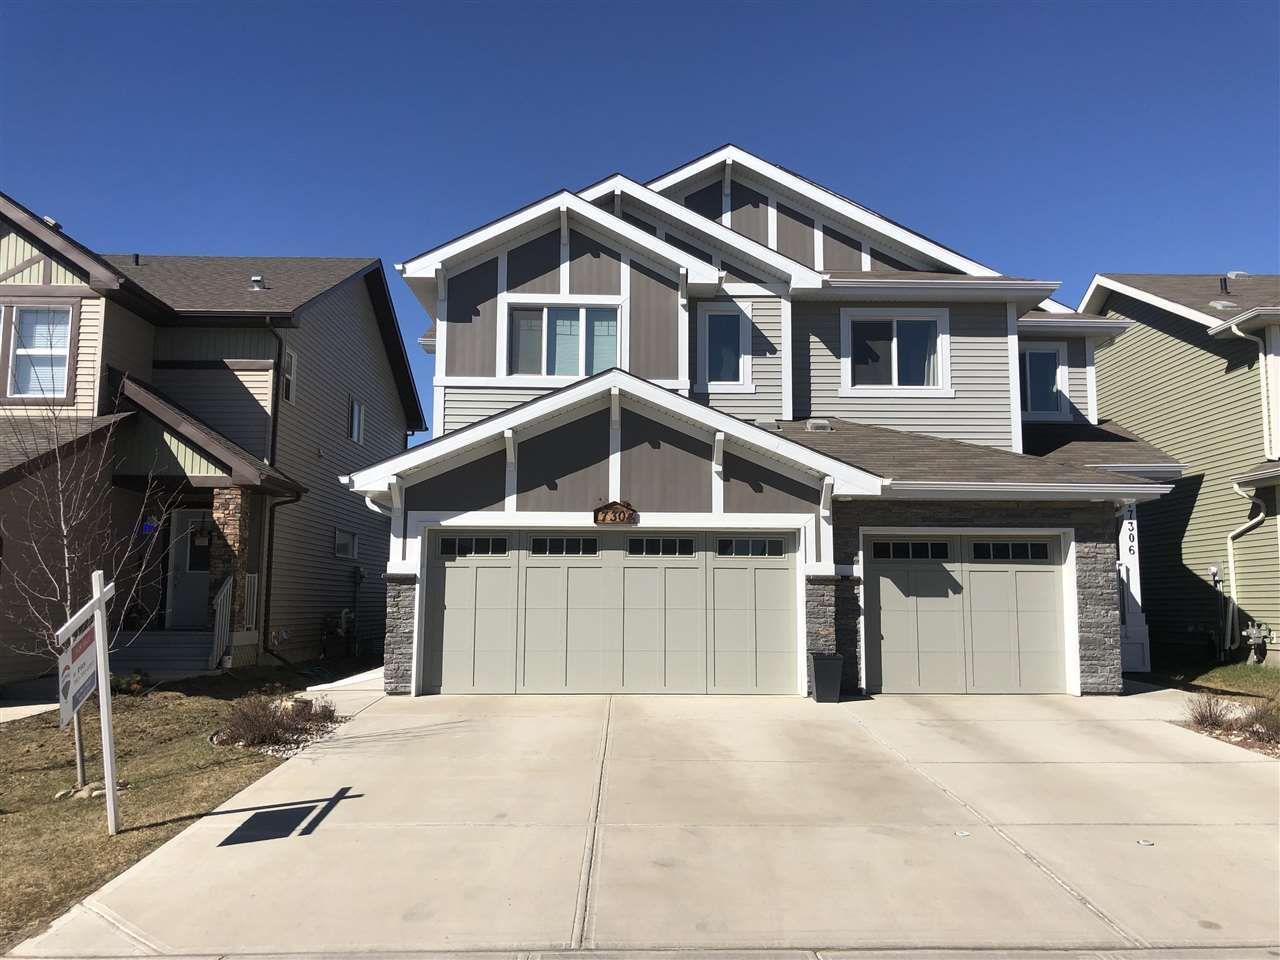 Main Photo: 17304 73 Street in Edmonton: Zone 28 House Half Duplex for sale : MLS®# E4150339